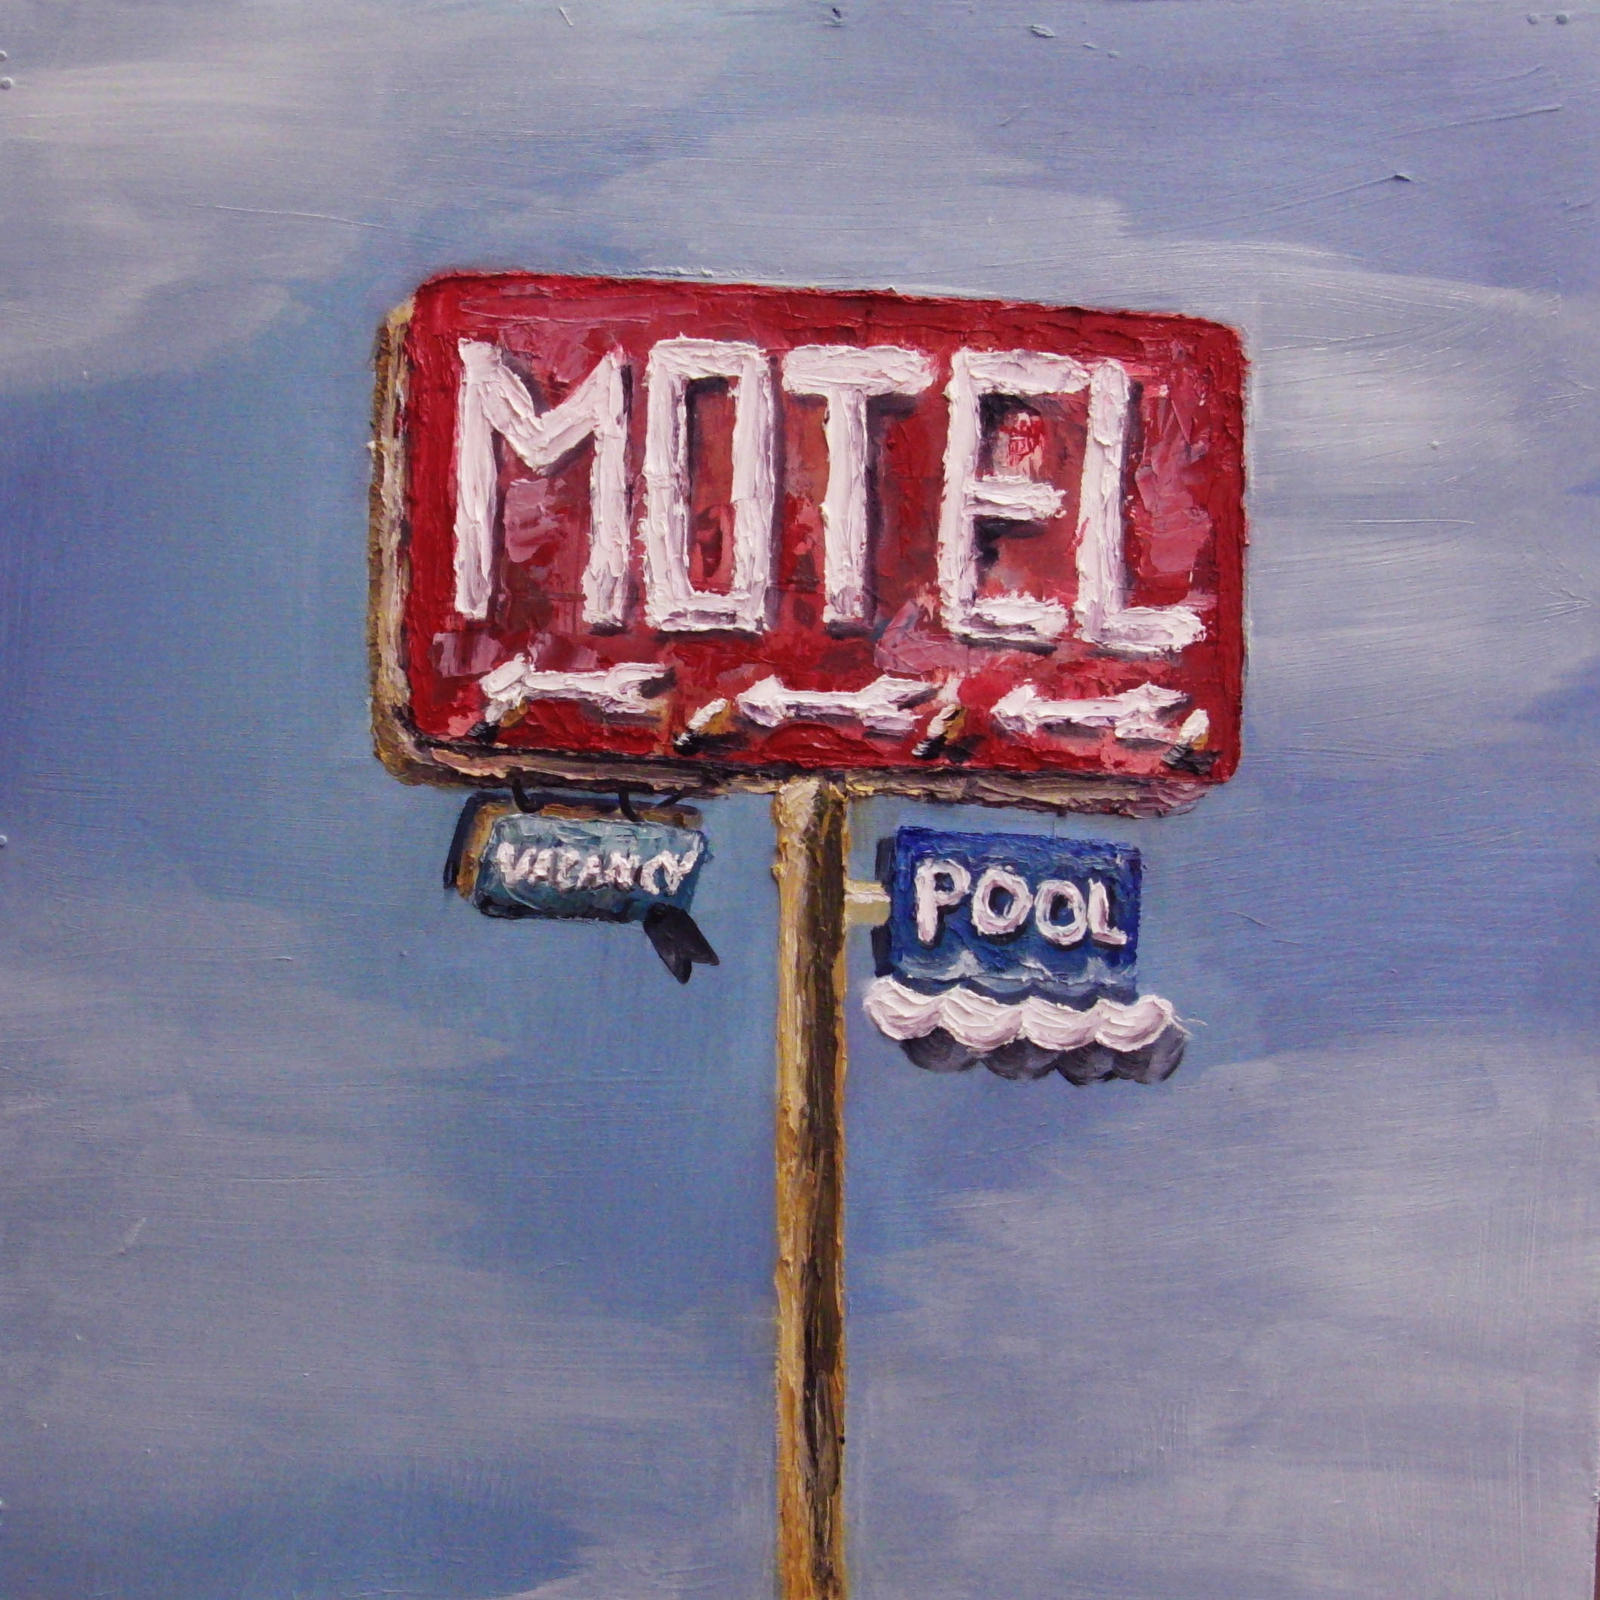 Motel Sign By Kmt95 On DeviantART